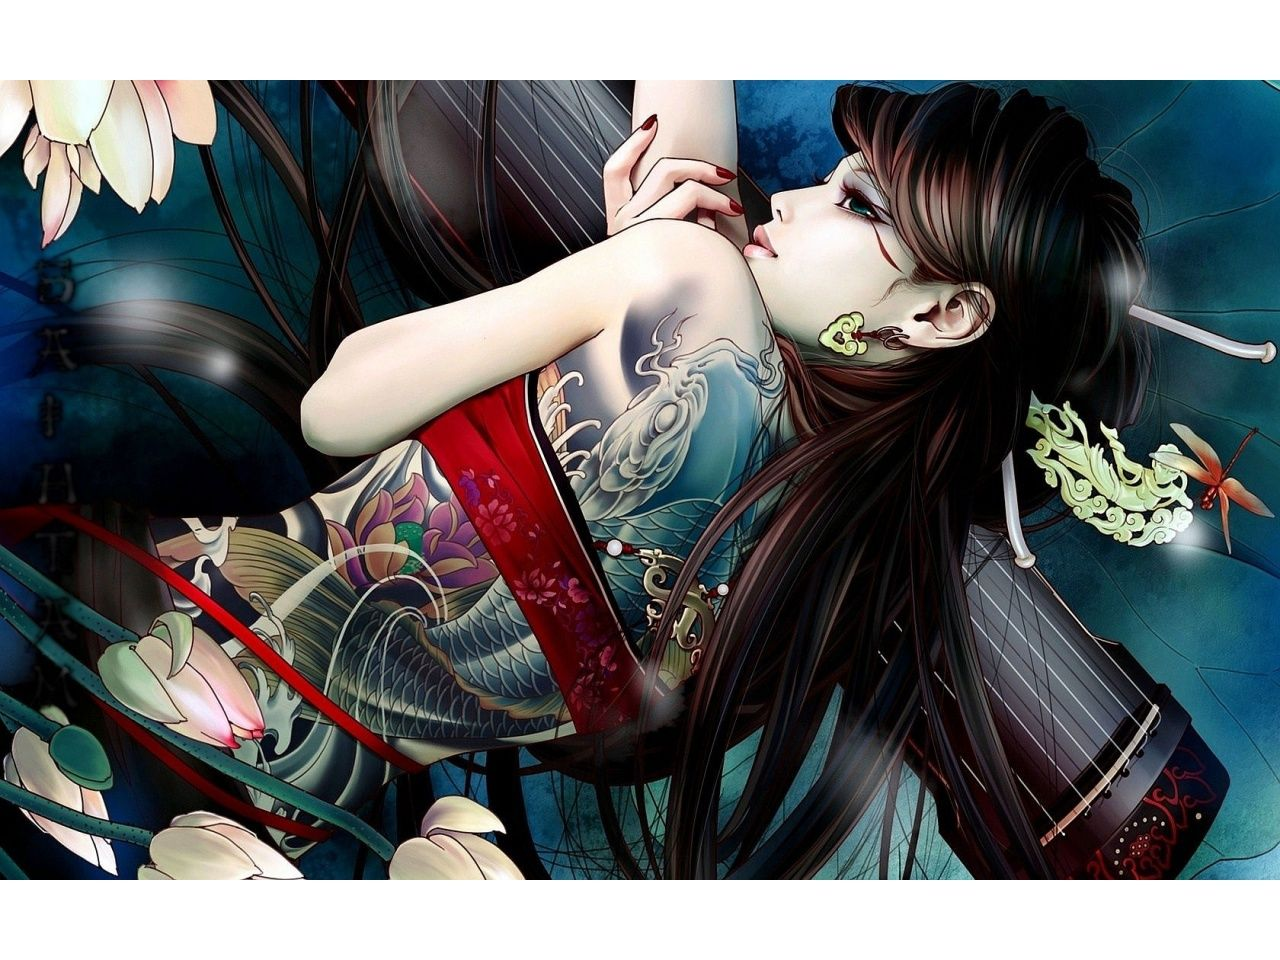 That 1 2 Tattoo Girl Wallpaper Fantasy Tattoos Girl Back Tattoos